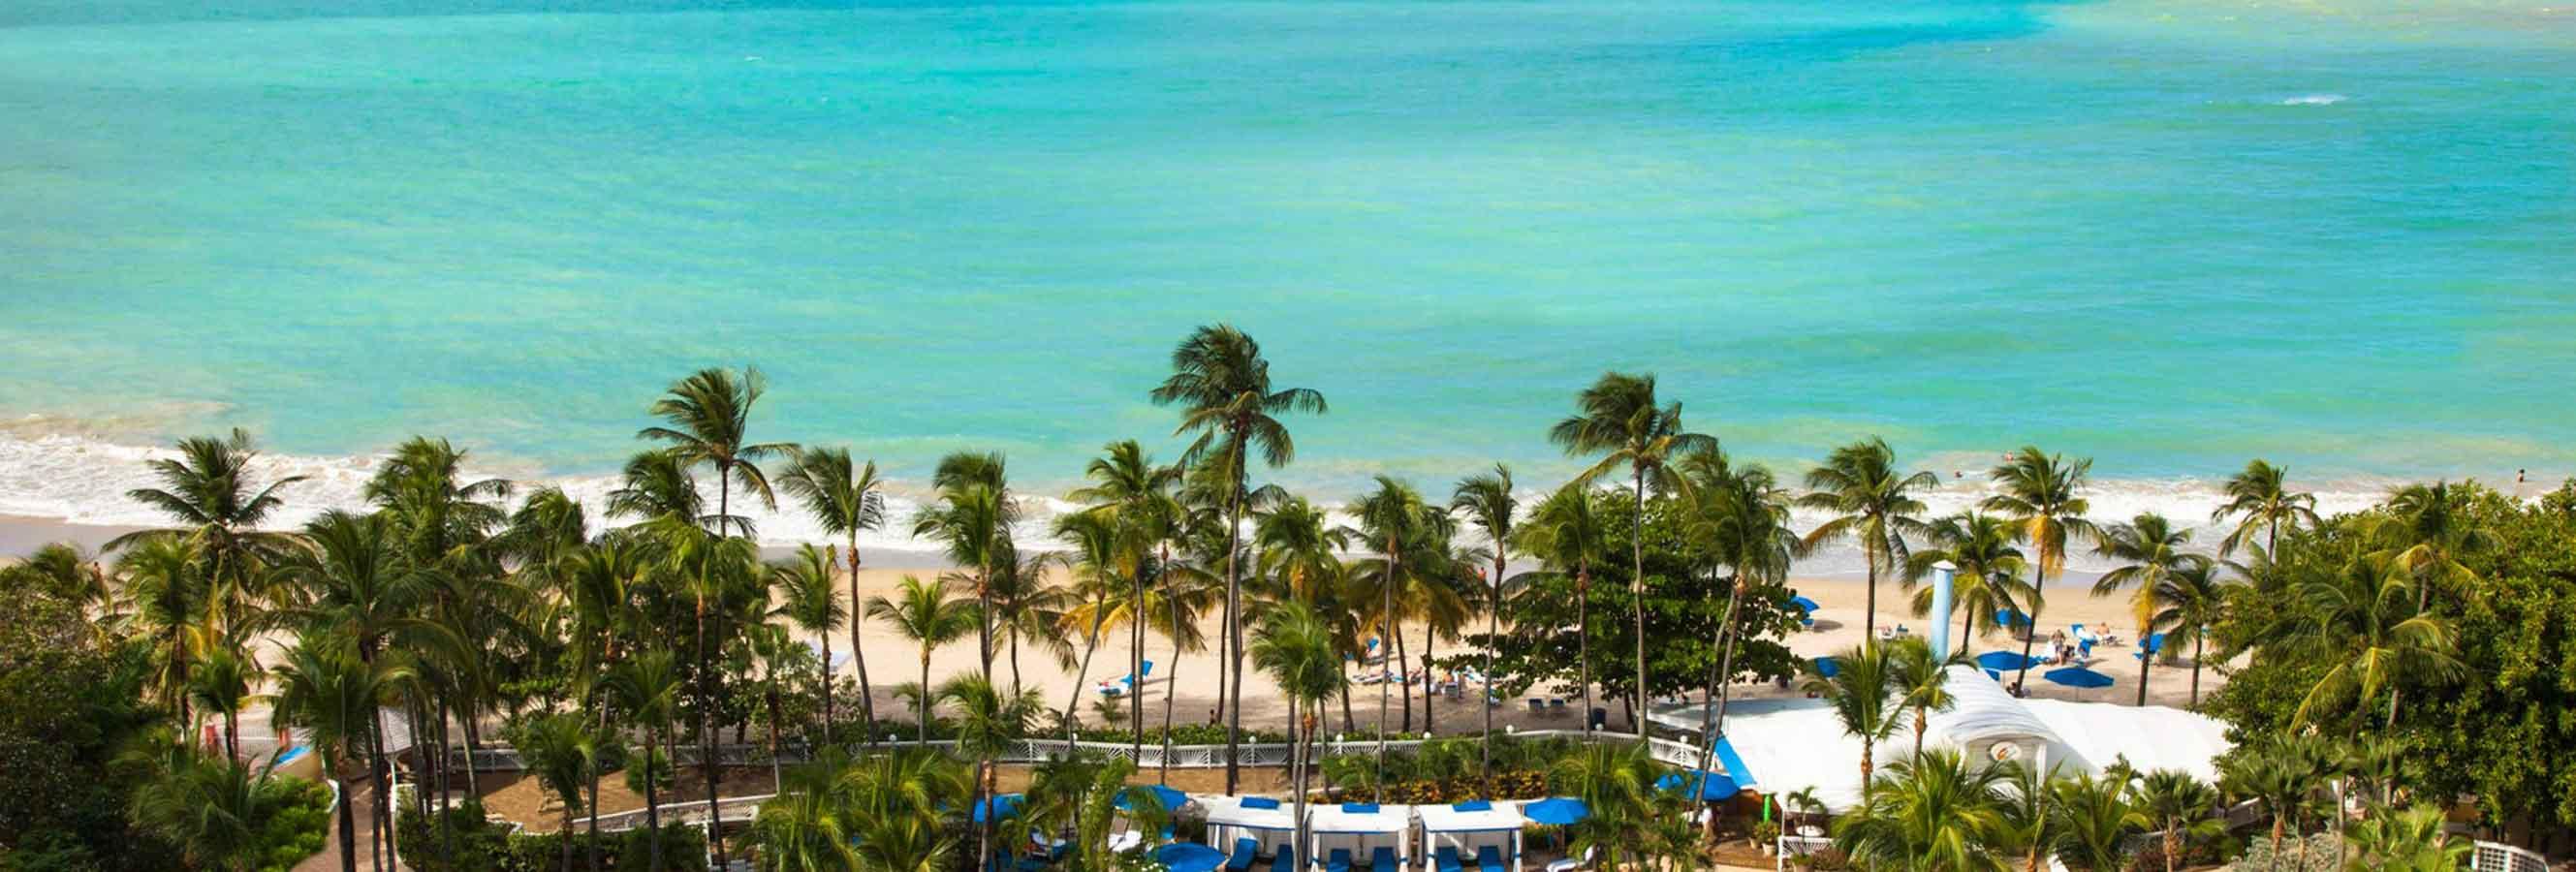 intercontinental san juan resort /u0026 casino puerto rico